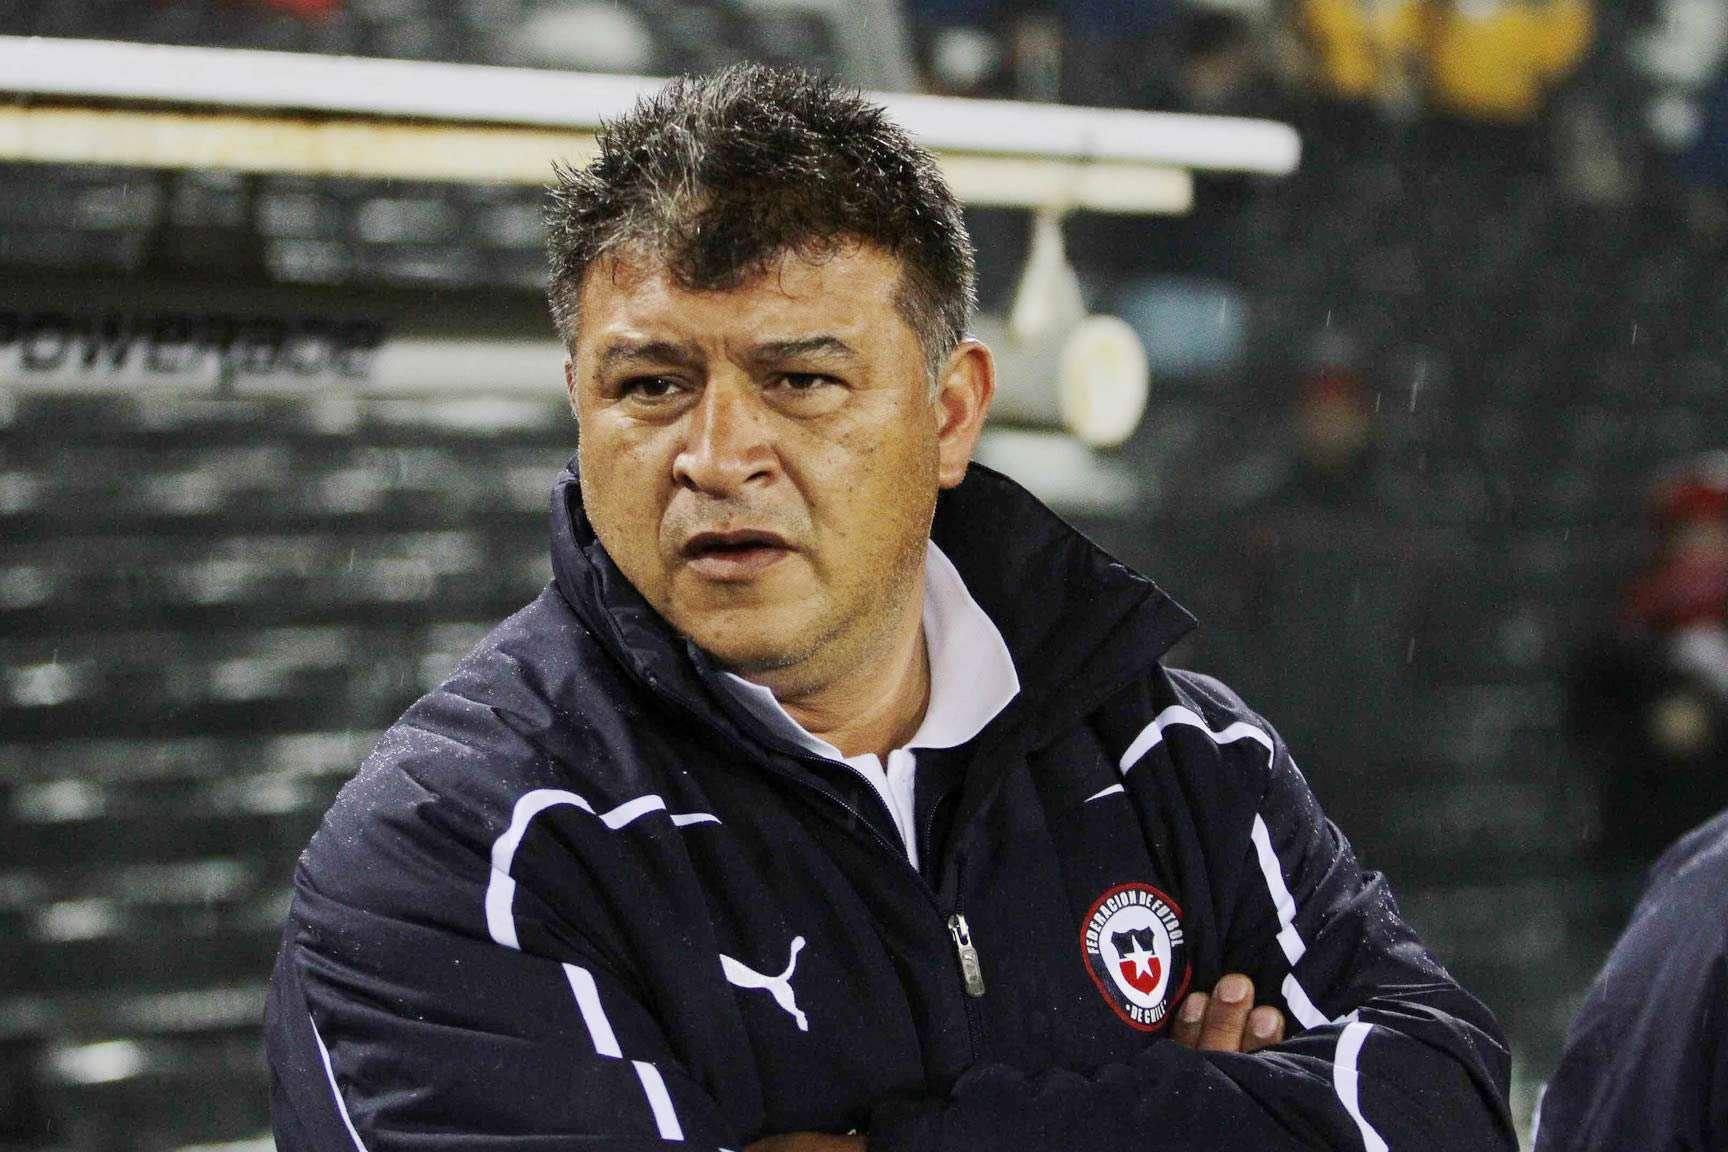 Borghi dispara otra vez contra Sampaoli y critica caso Vidal